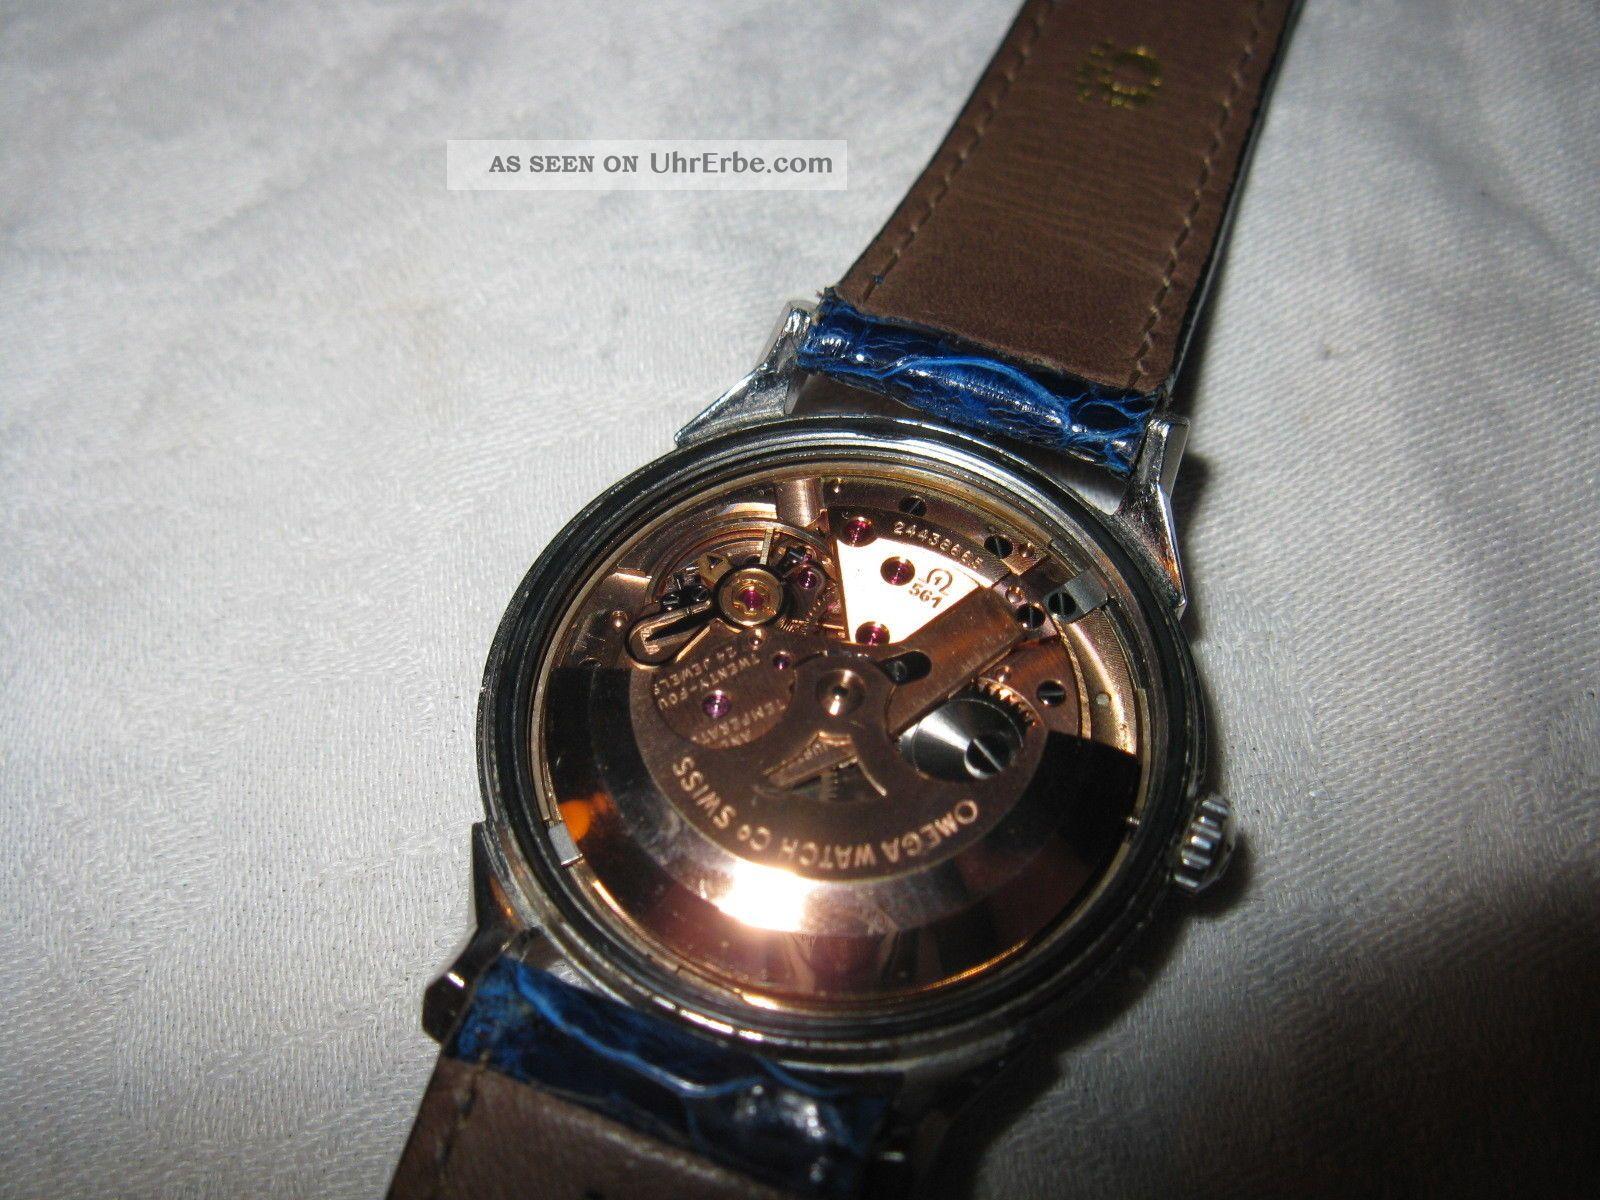 Wunderschöne Omega - Constellation Cal 561 Pie - Pan Armbanduhren Bild